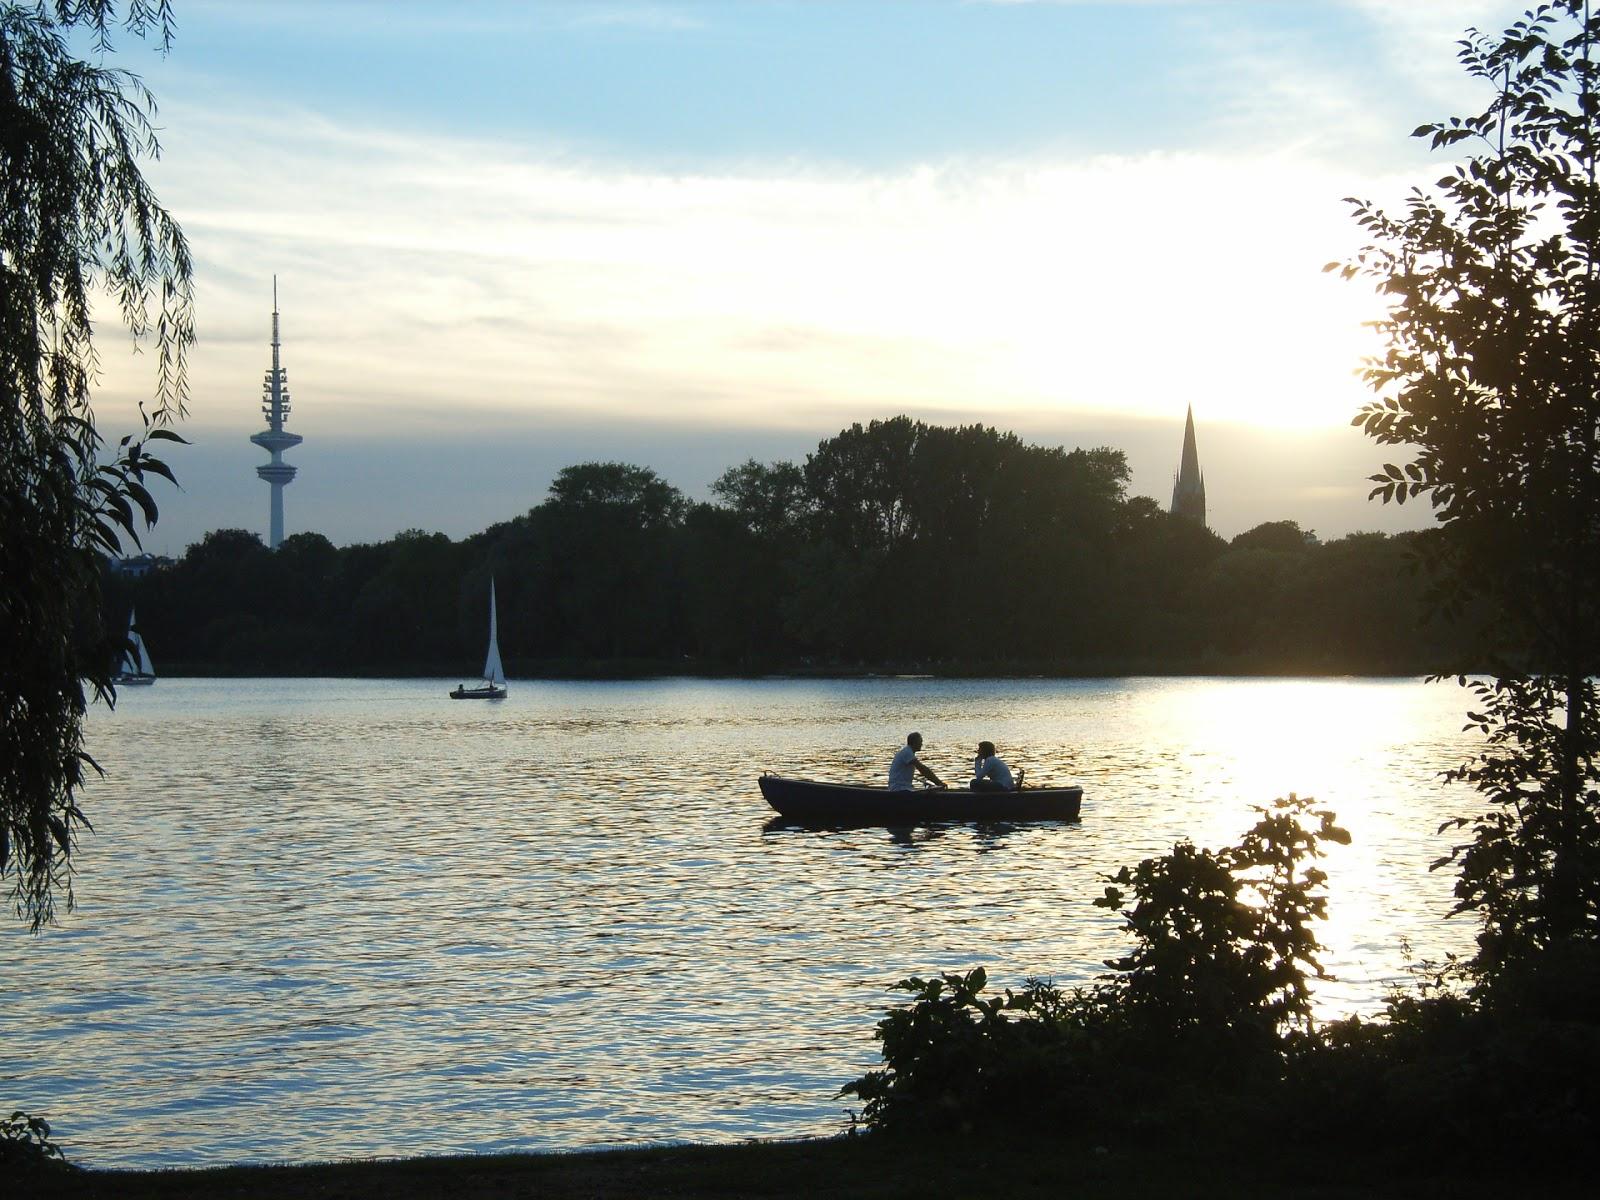 Alster - Fernsehturm - Segelboot - Ruderer